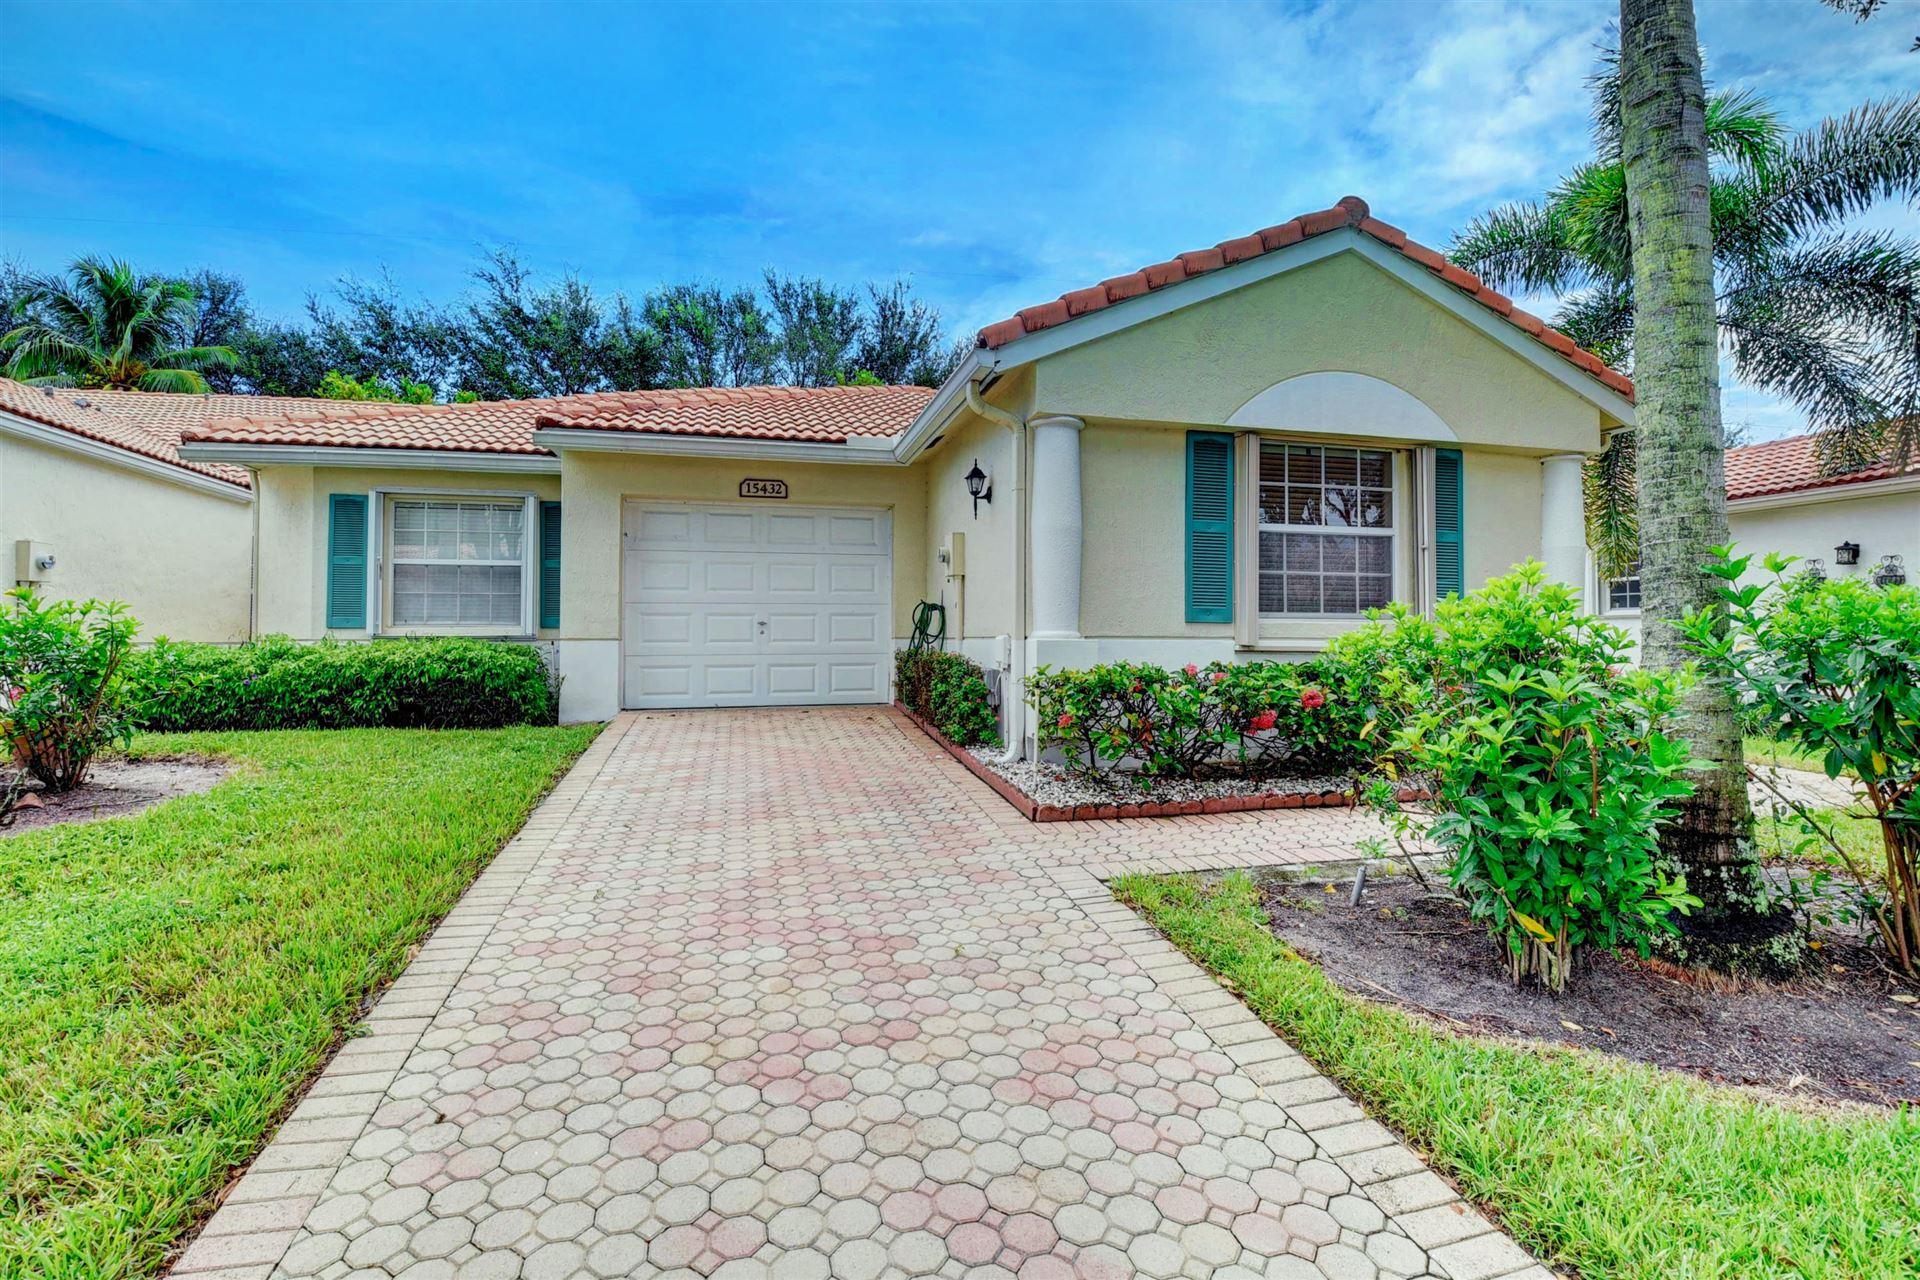 15432 Rosaire Lane, Delray Beach, FL 33484 - #: RX-10653985